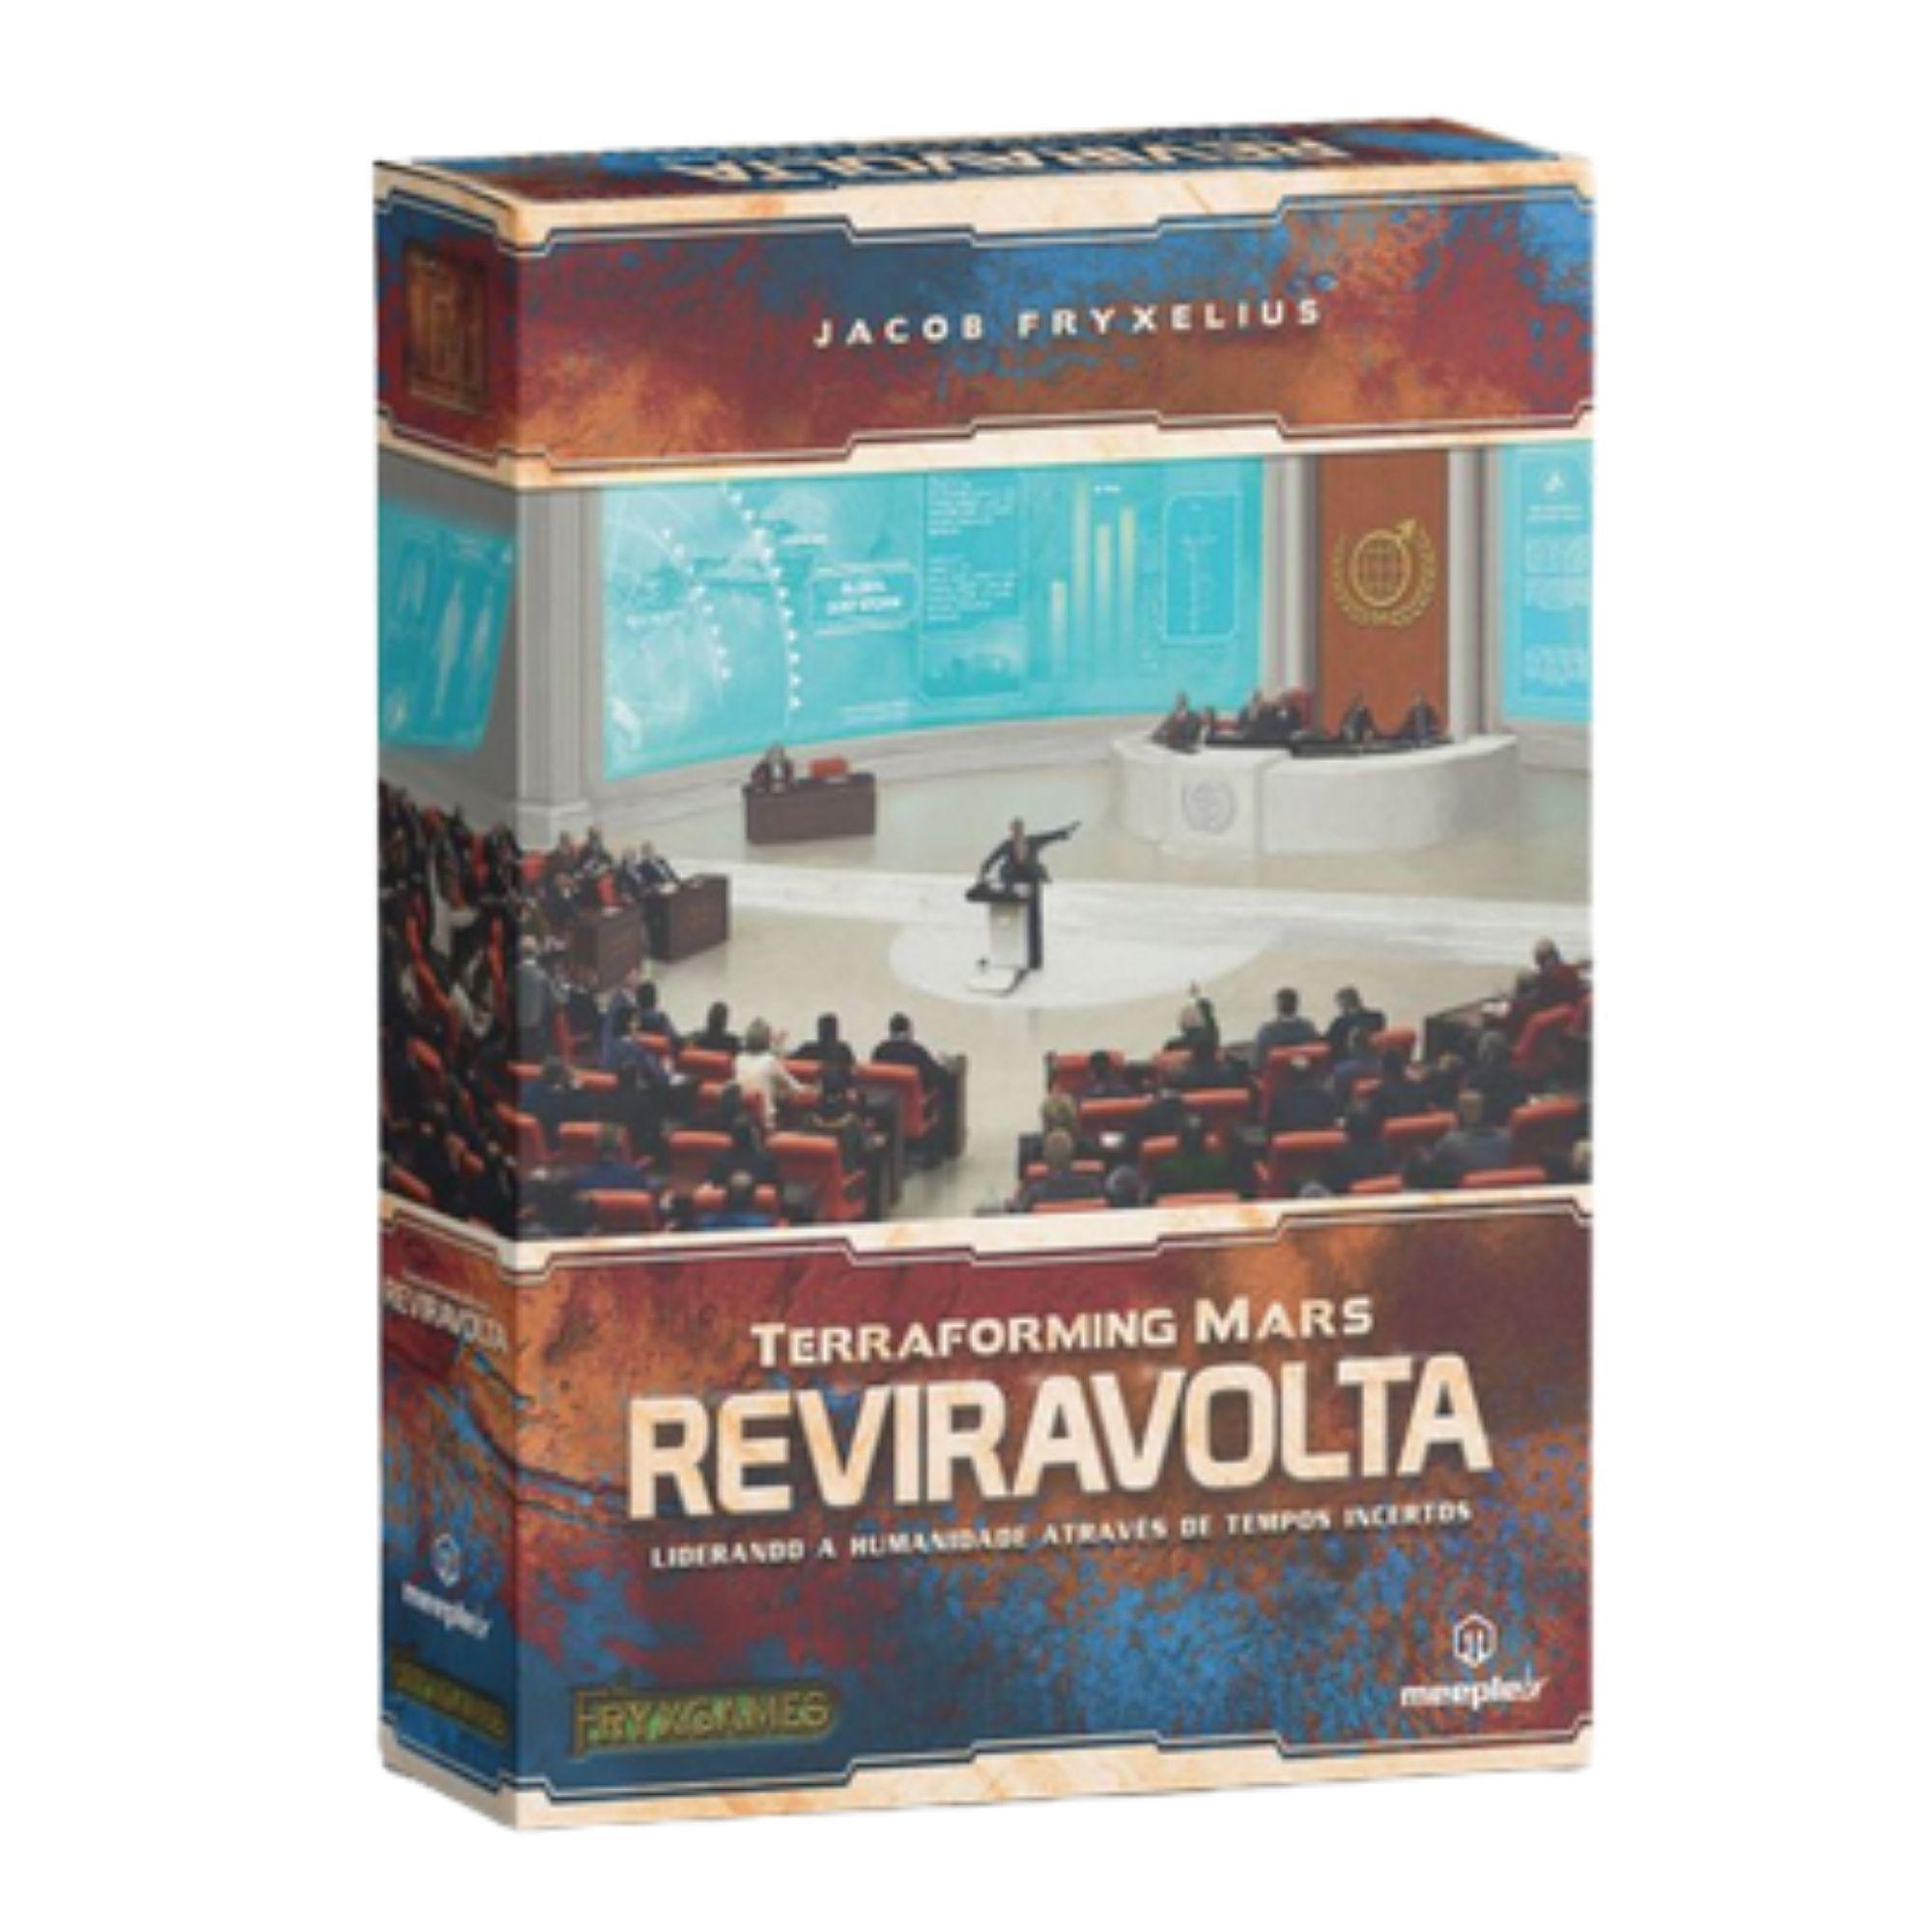 Terraforming Mars: Reviravolta - Expansão